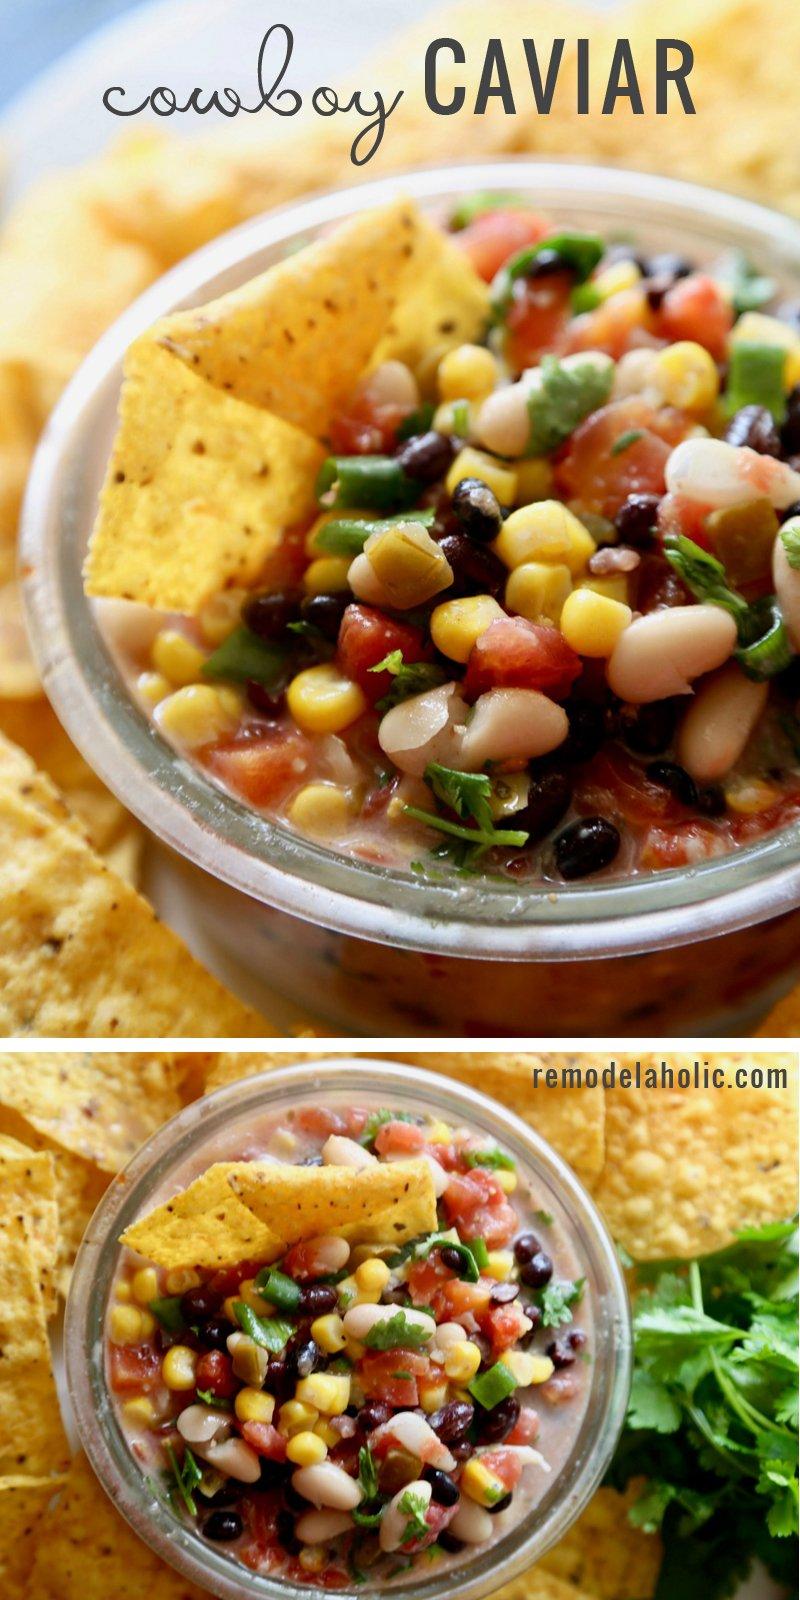 Perfect dip for a party! Try this Cowboy Caviar Recipe via Remodelaholic.com